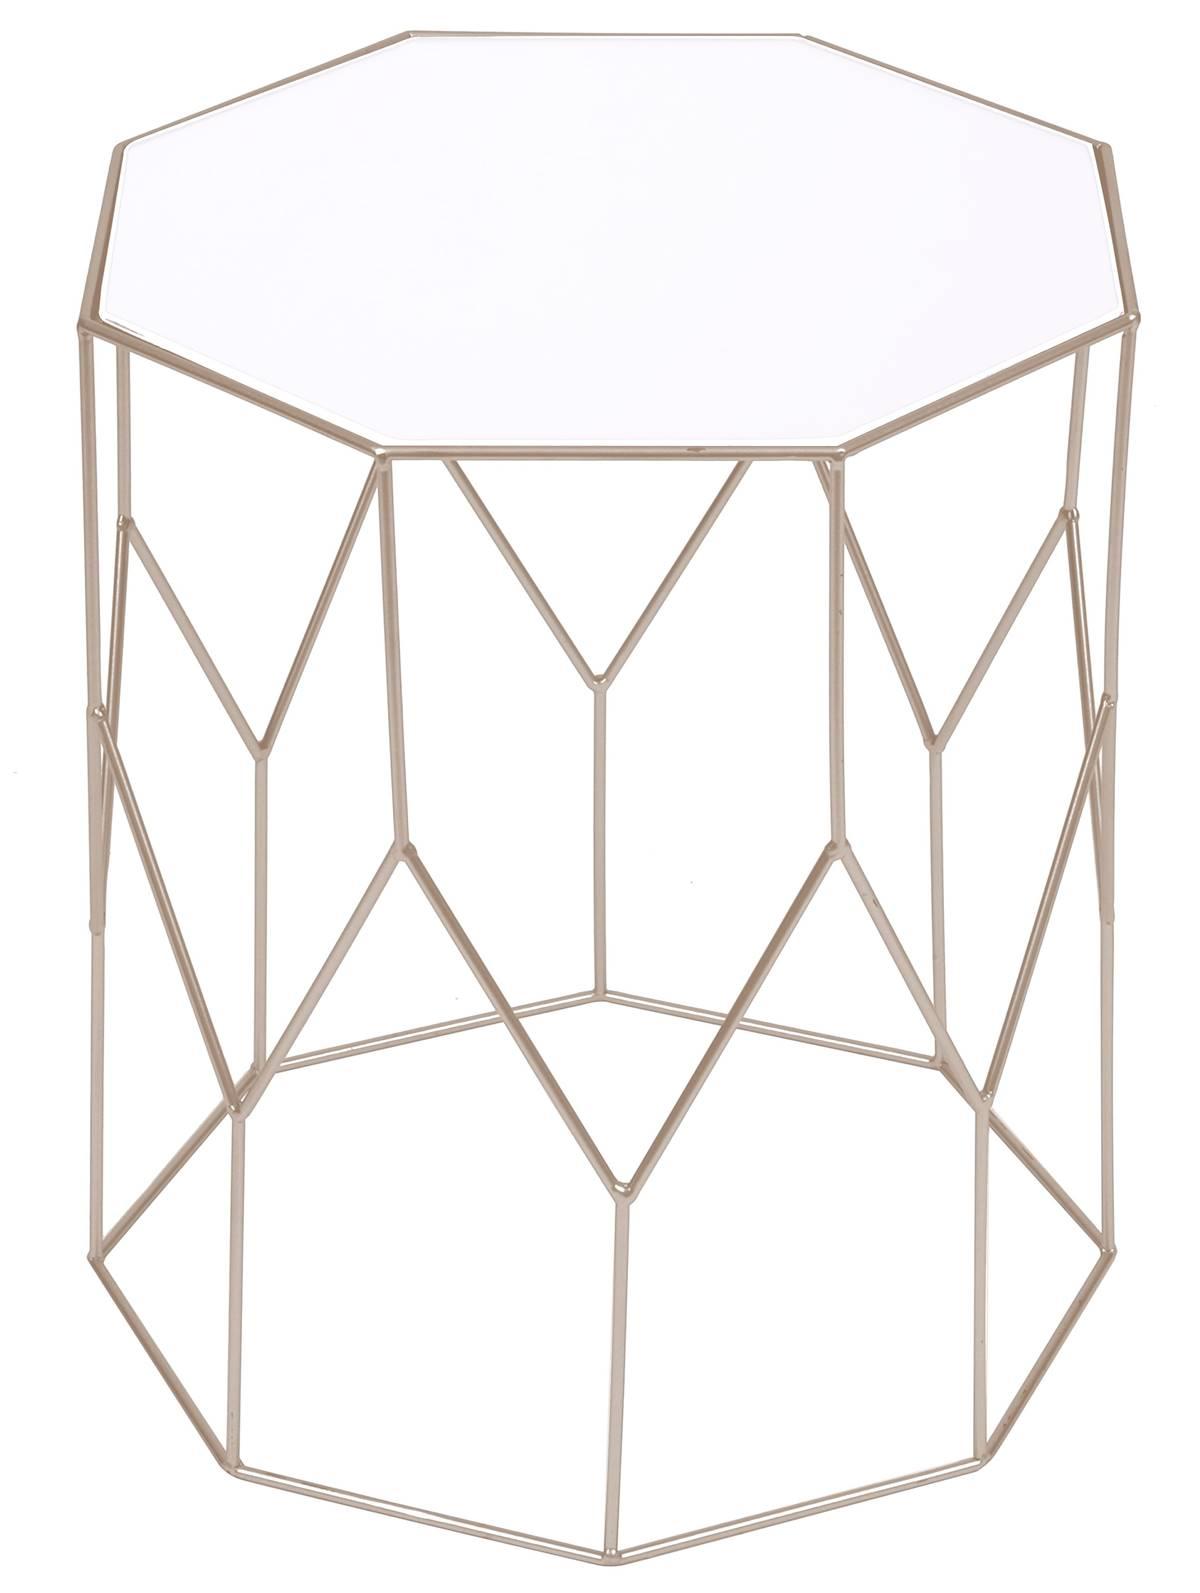 Mesa Apoio Triade Tampo Espelhado Base Dourada 37 cm (LARG) - 55956